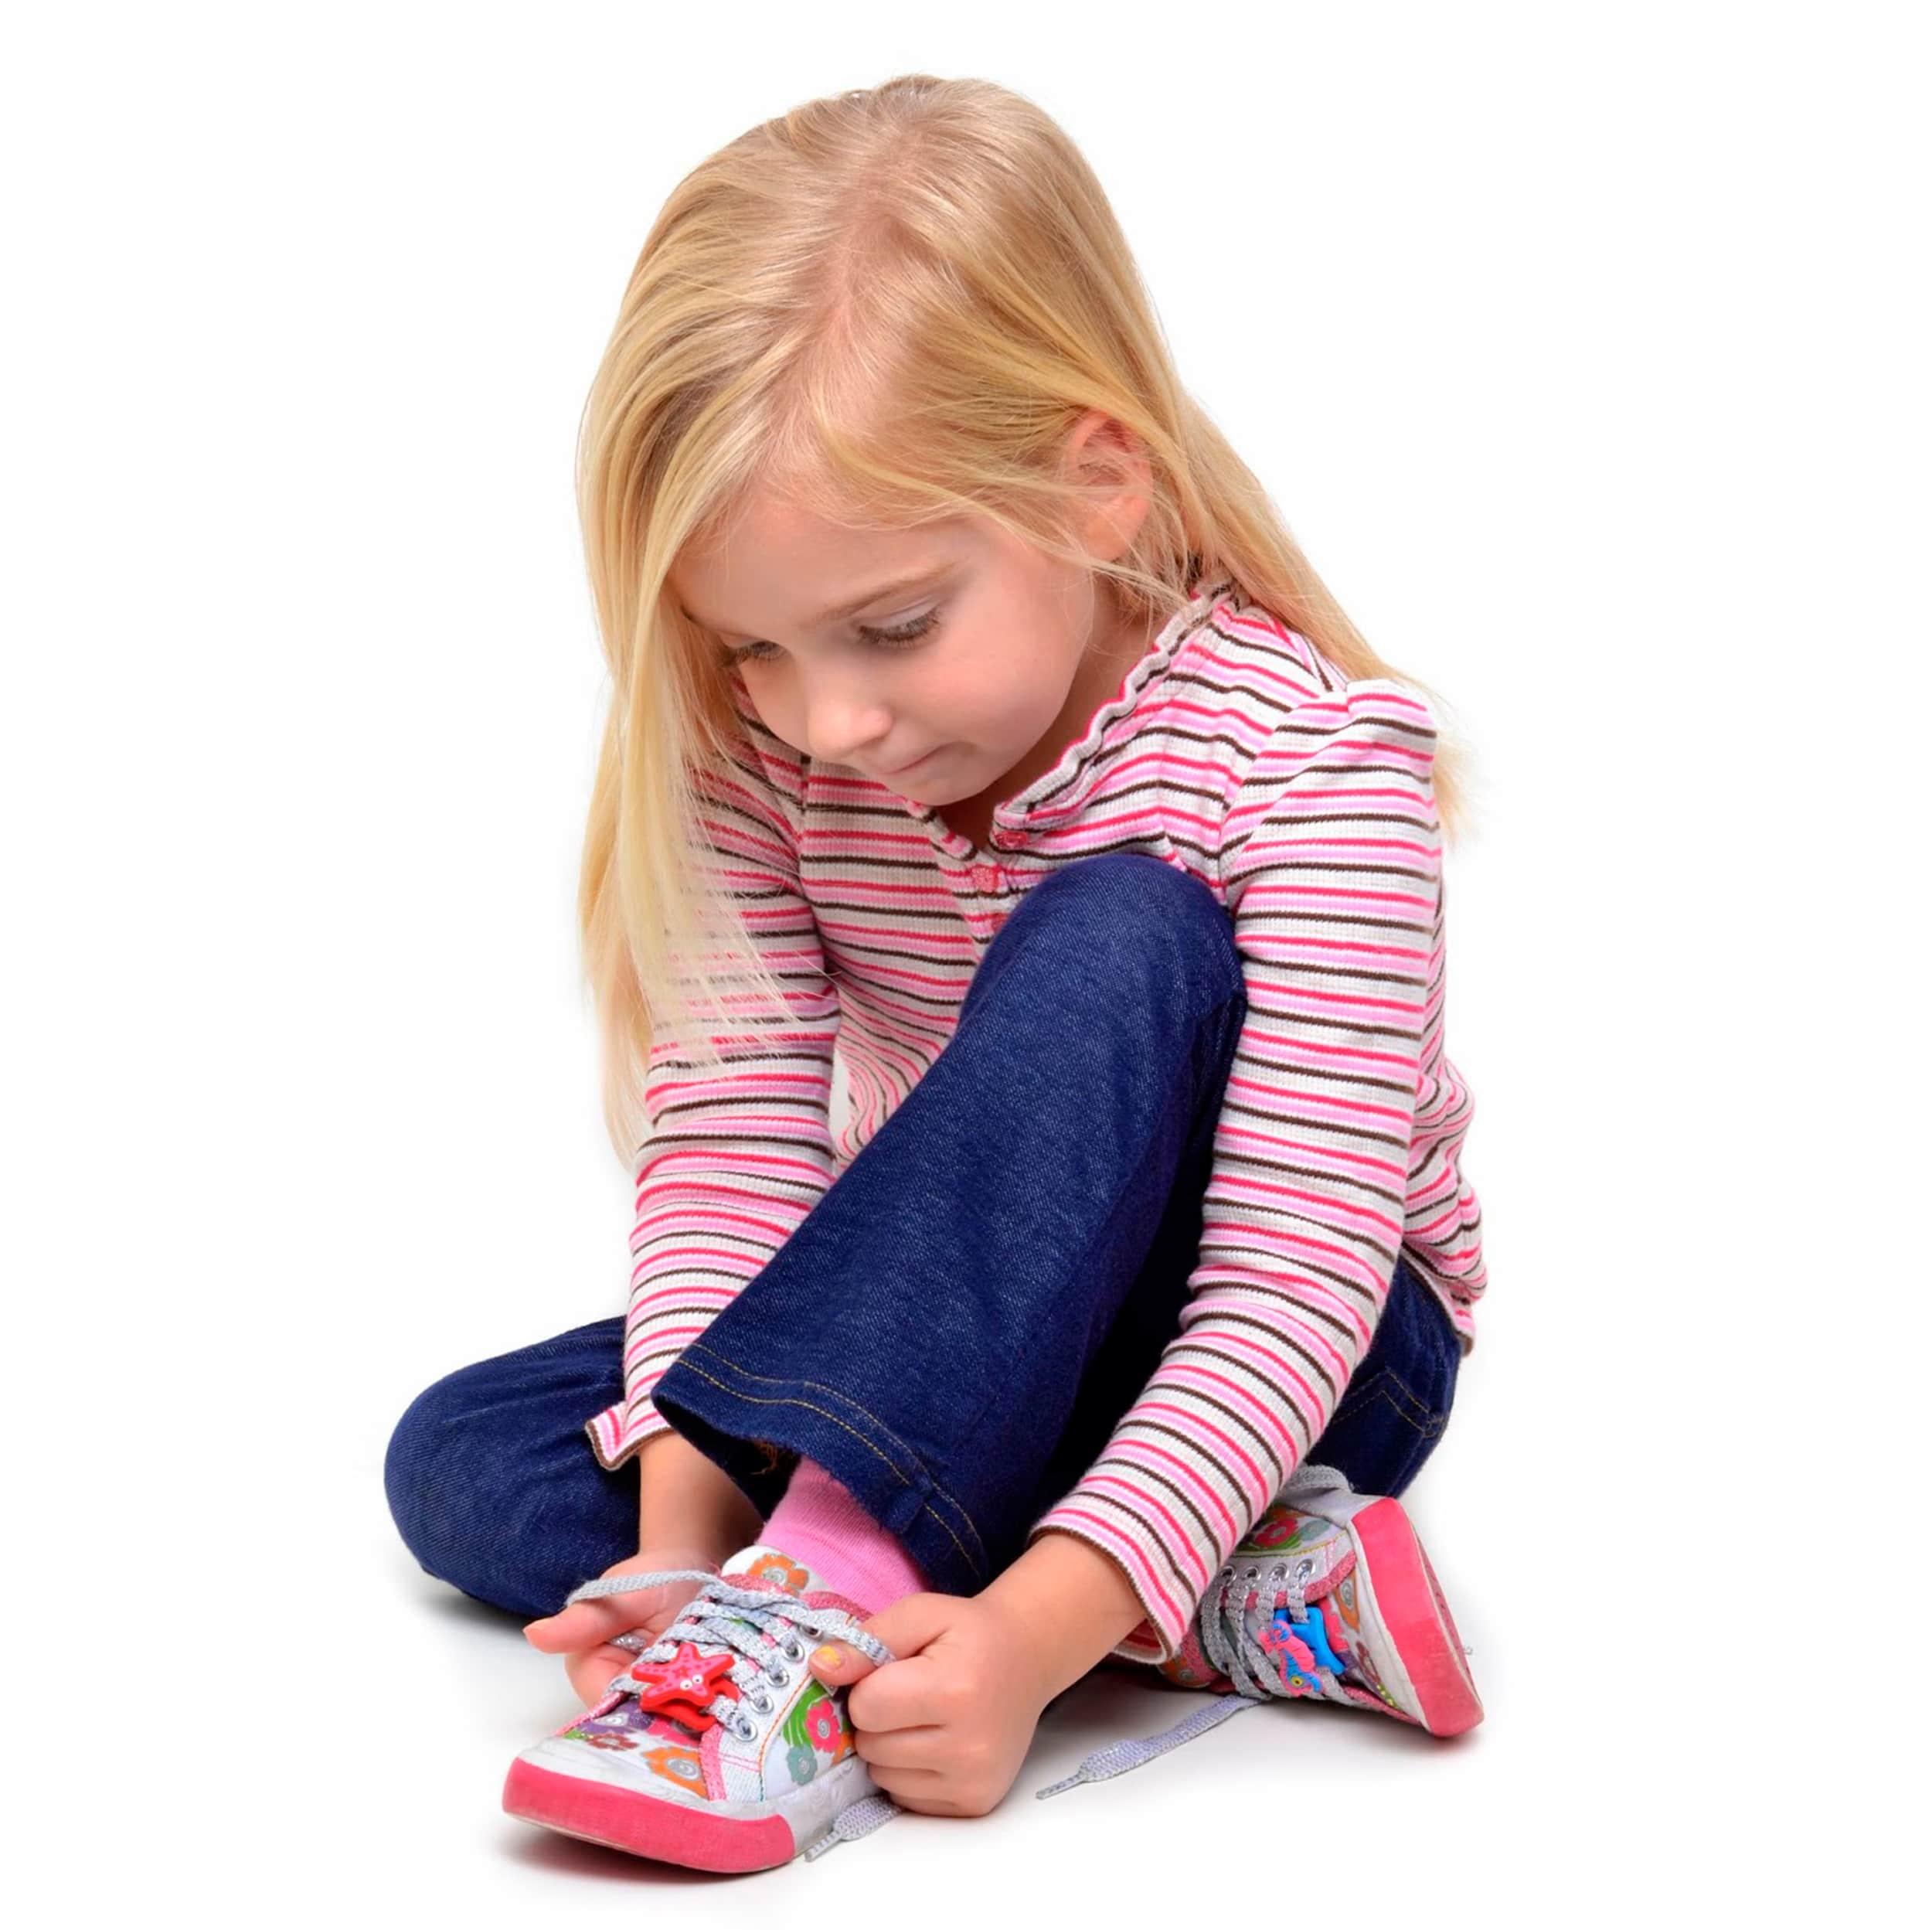 Calzado infantil niña de calidad online